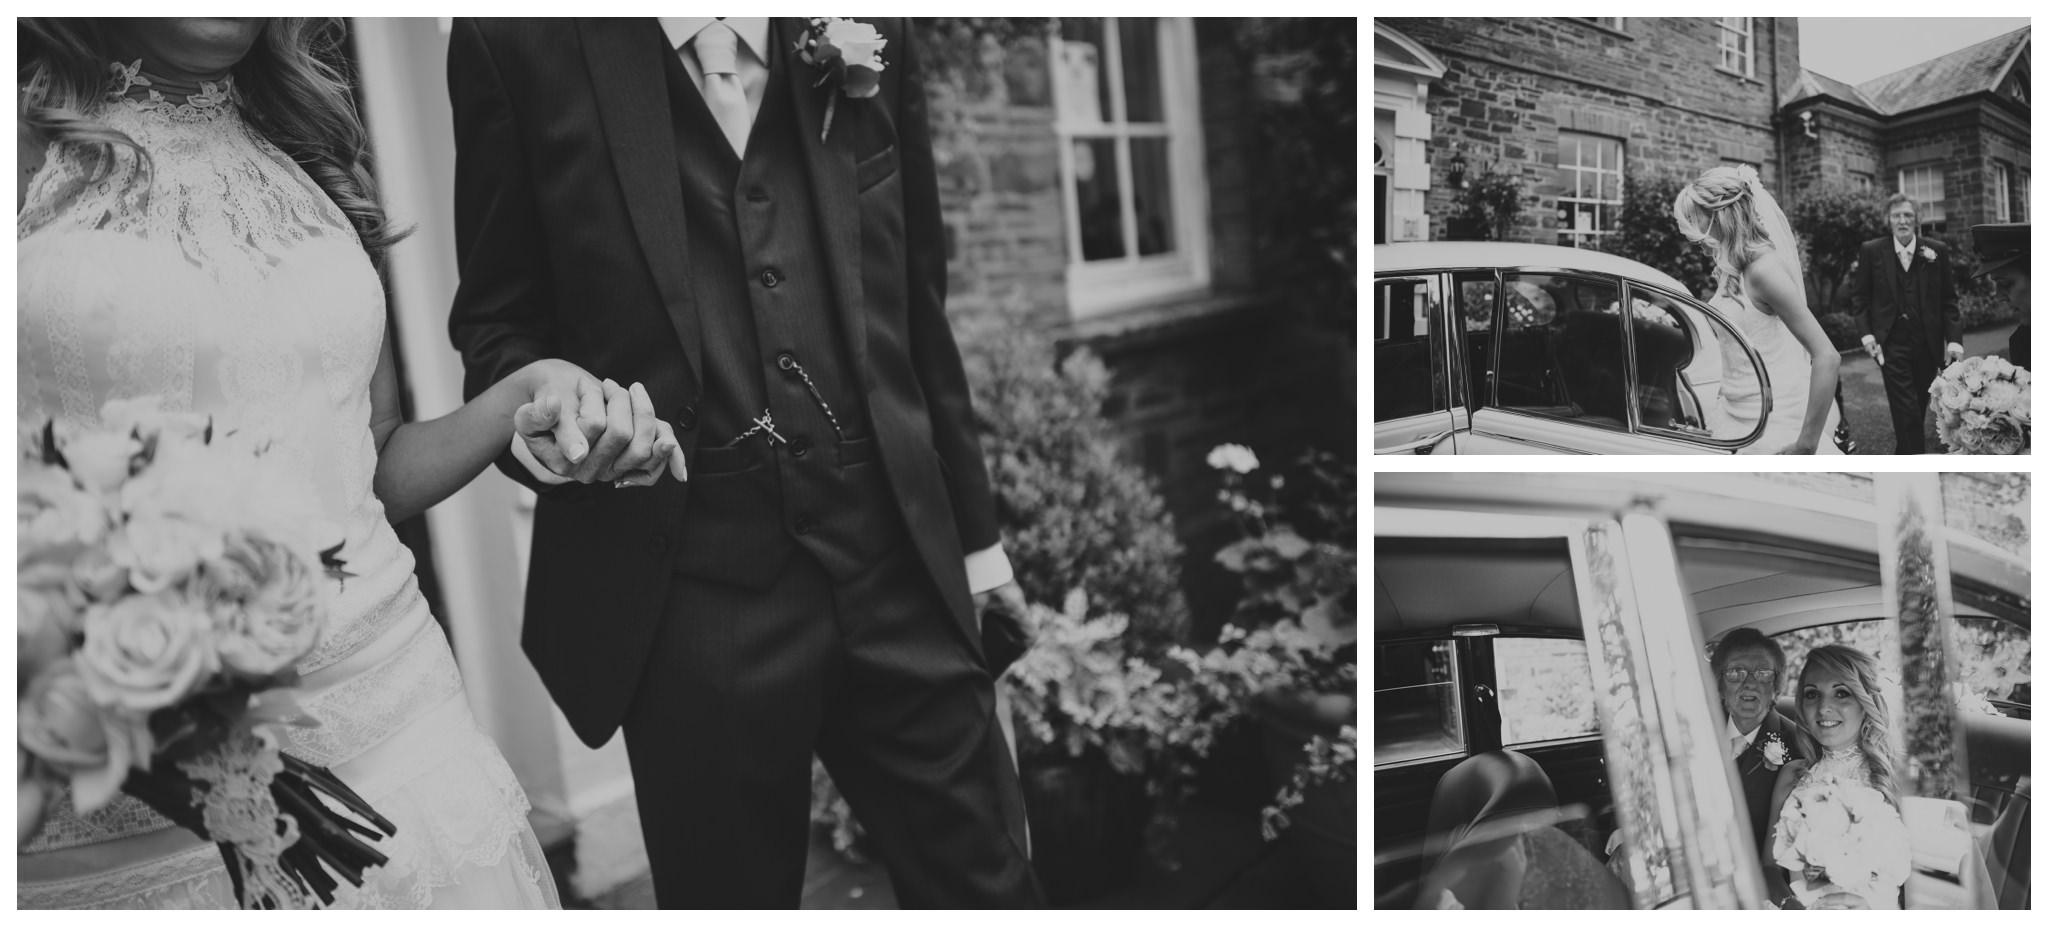 Richard Savage Photography - Wedding - Peterstone Court Brecon - 2016-05-11_0020